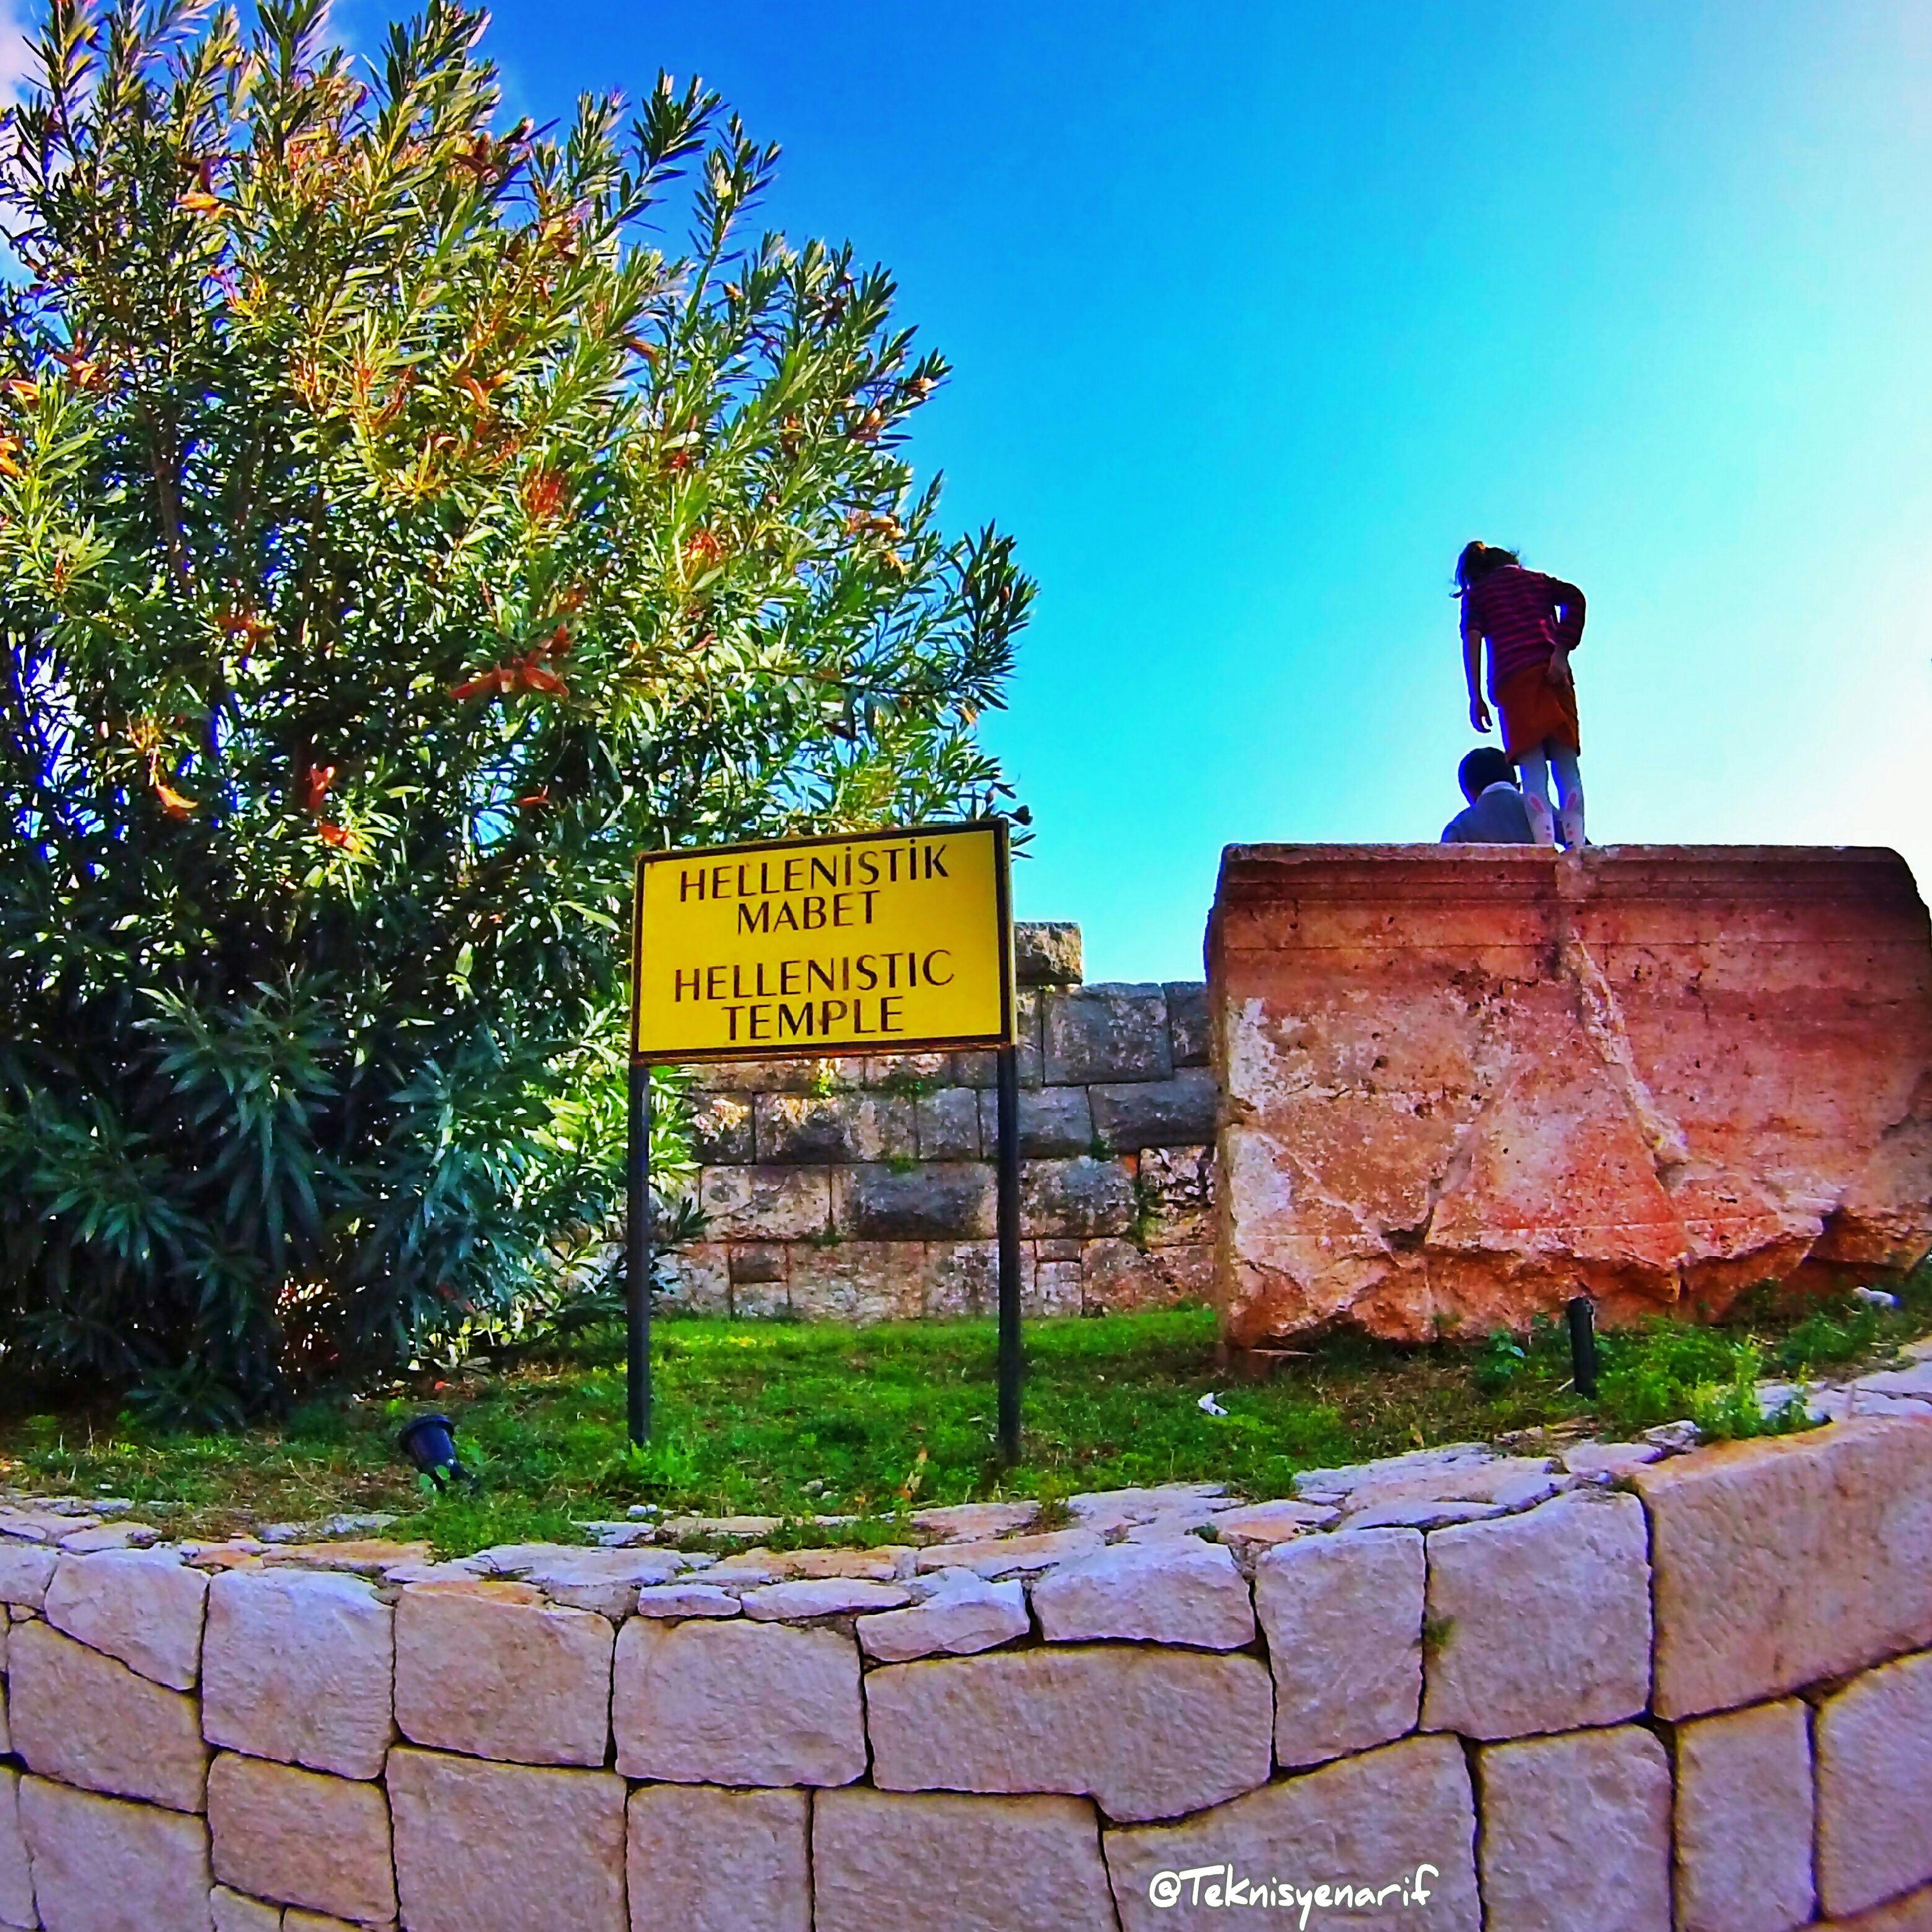 Hellenistik mabet kaş Hellenistik Mabet Kas Likya Tarihieser